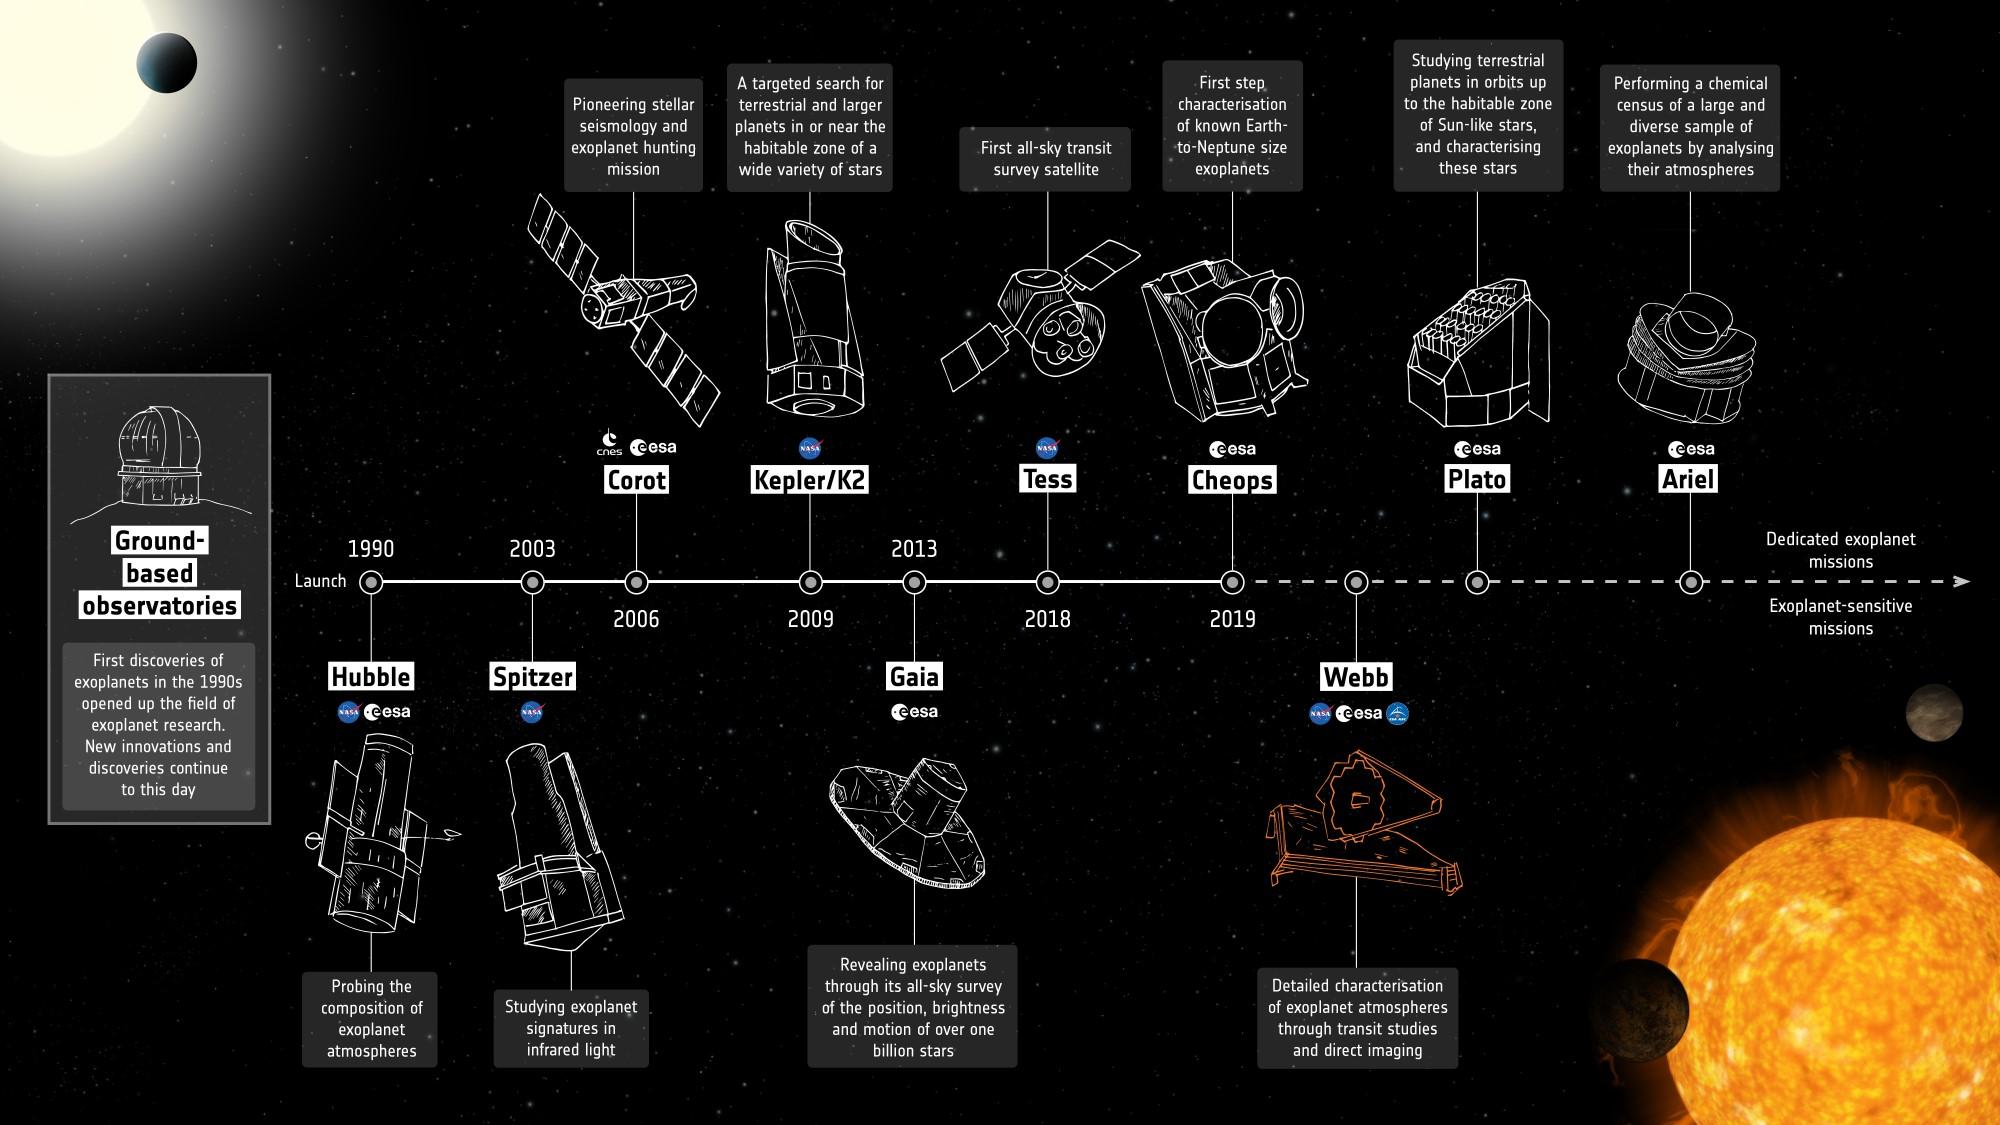 Exoplanets_missions_20201127_webb_2k.jpg